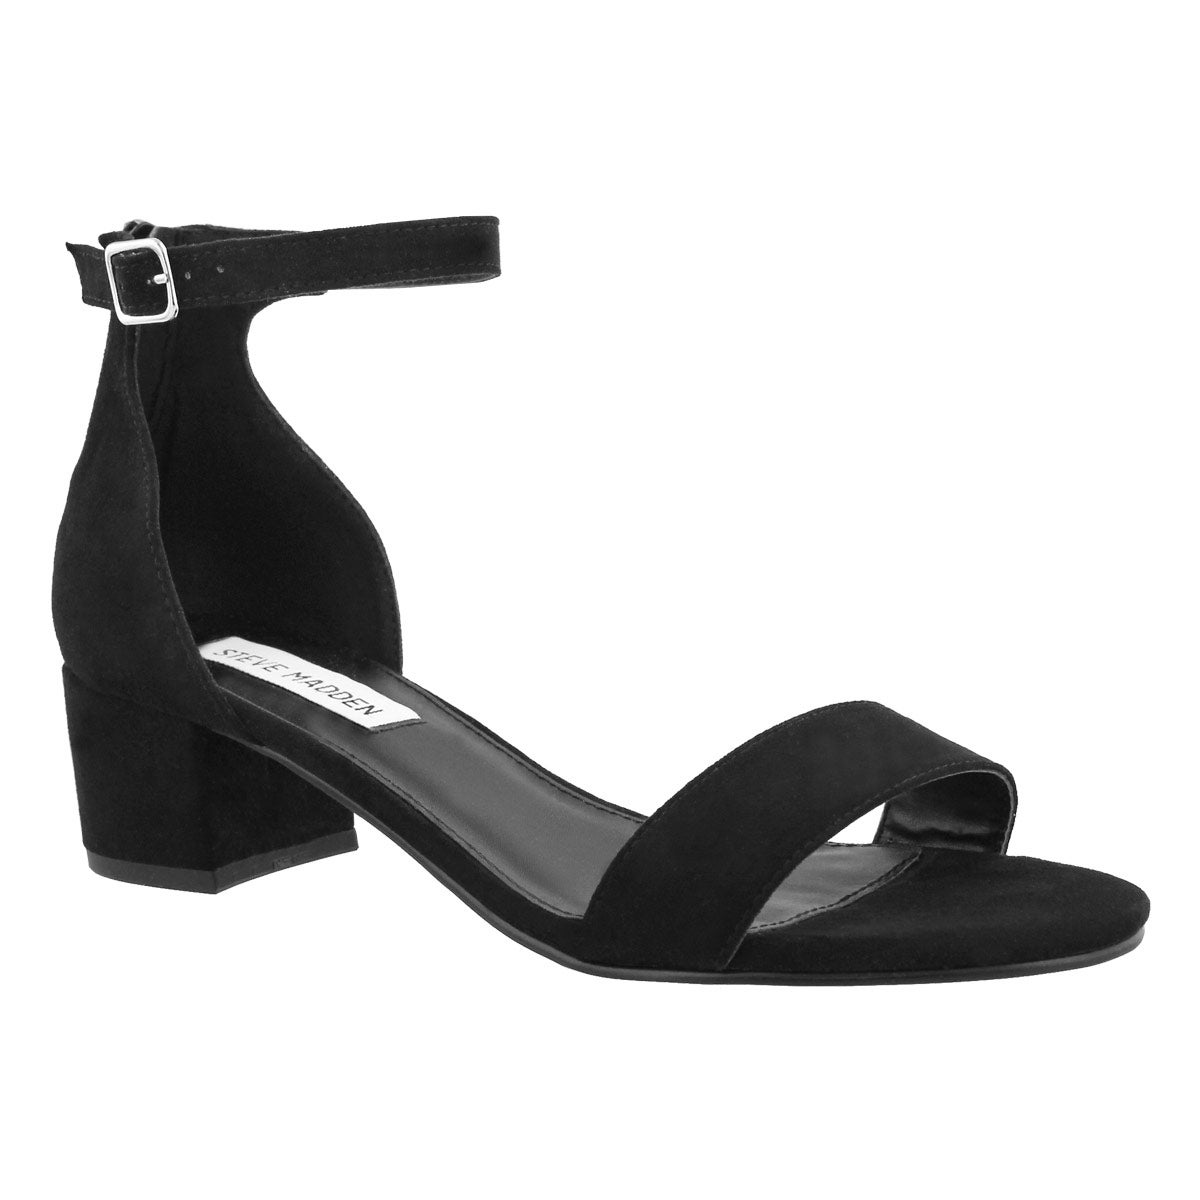 Women's FABIANA black ankle strap dress sandals